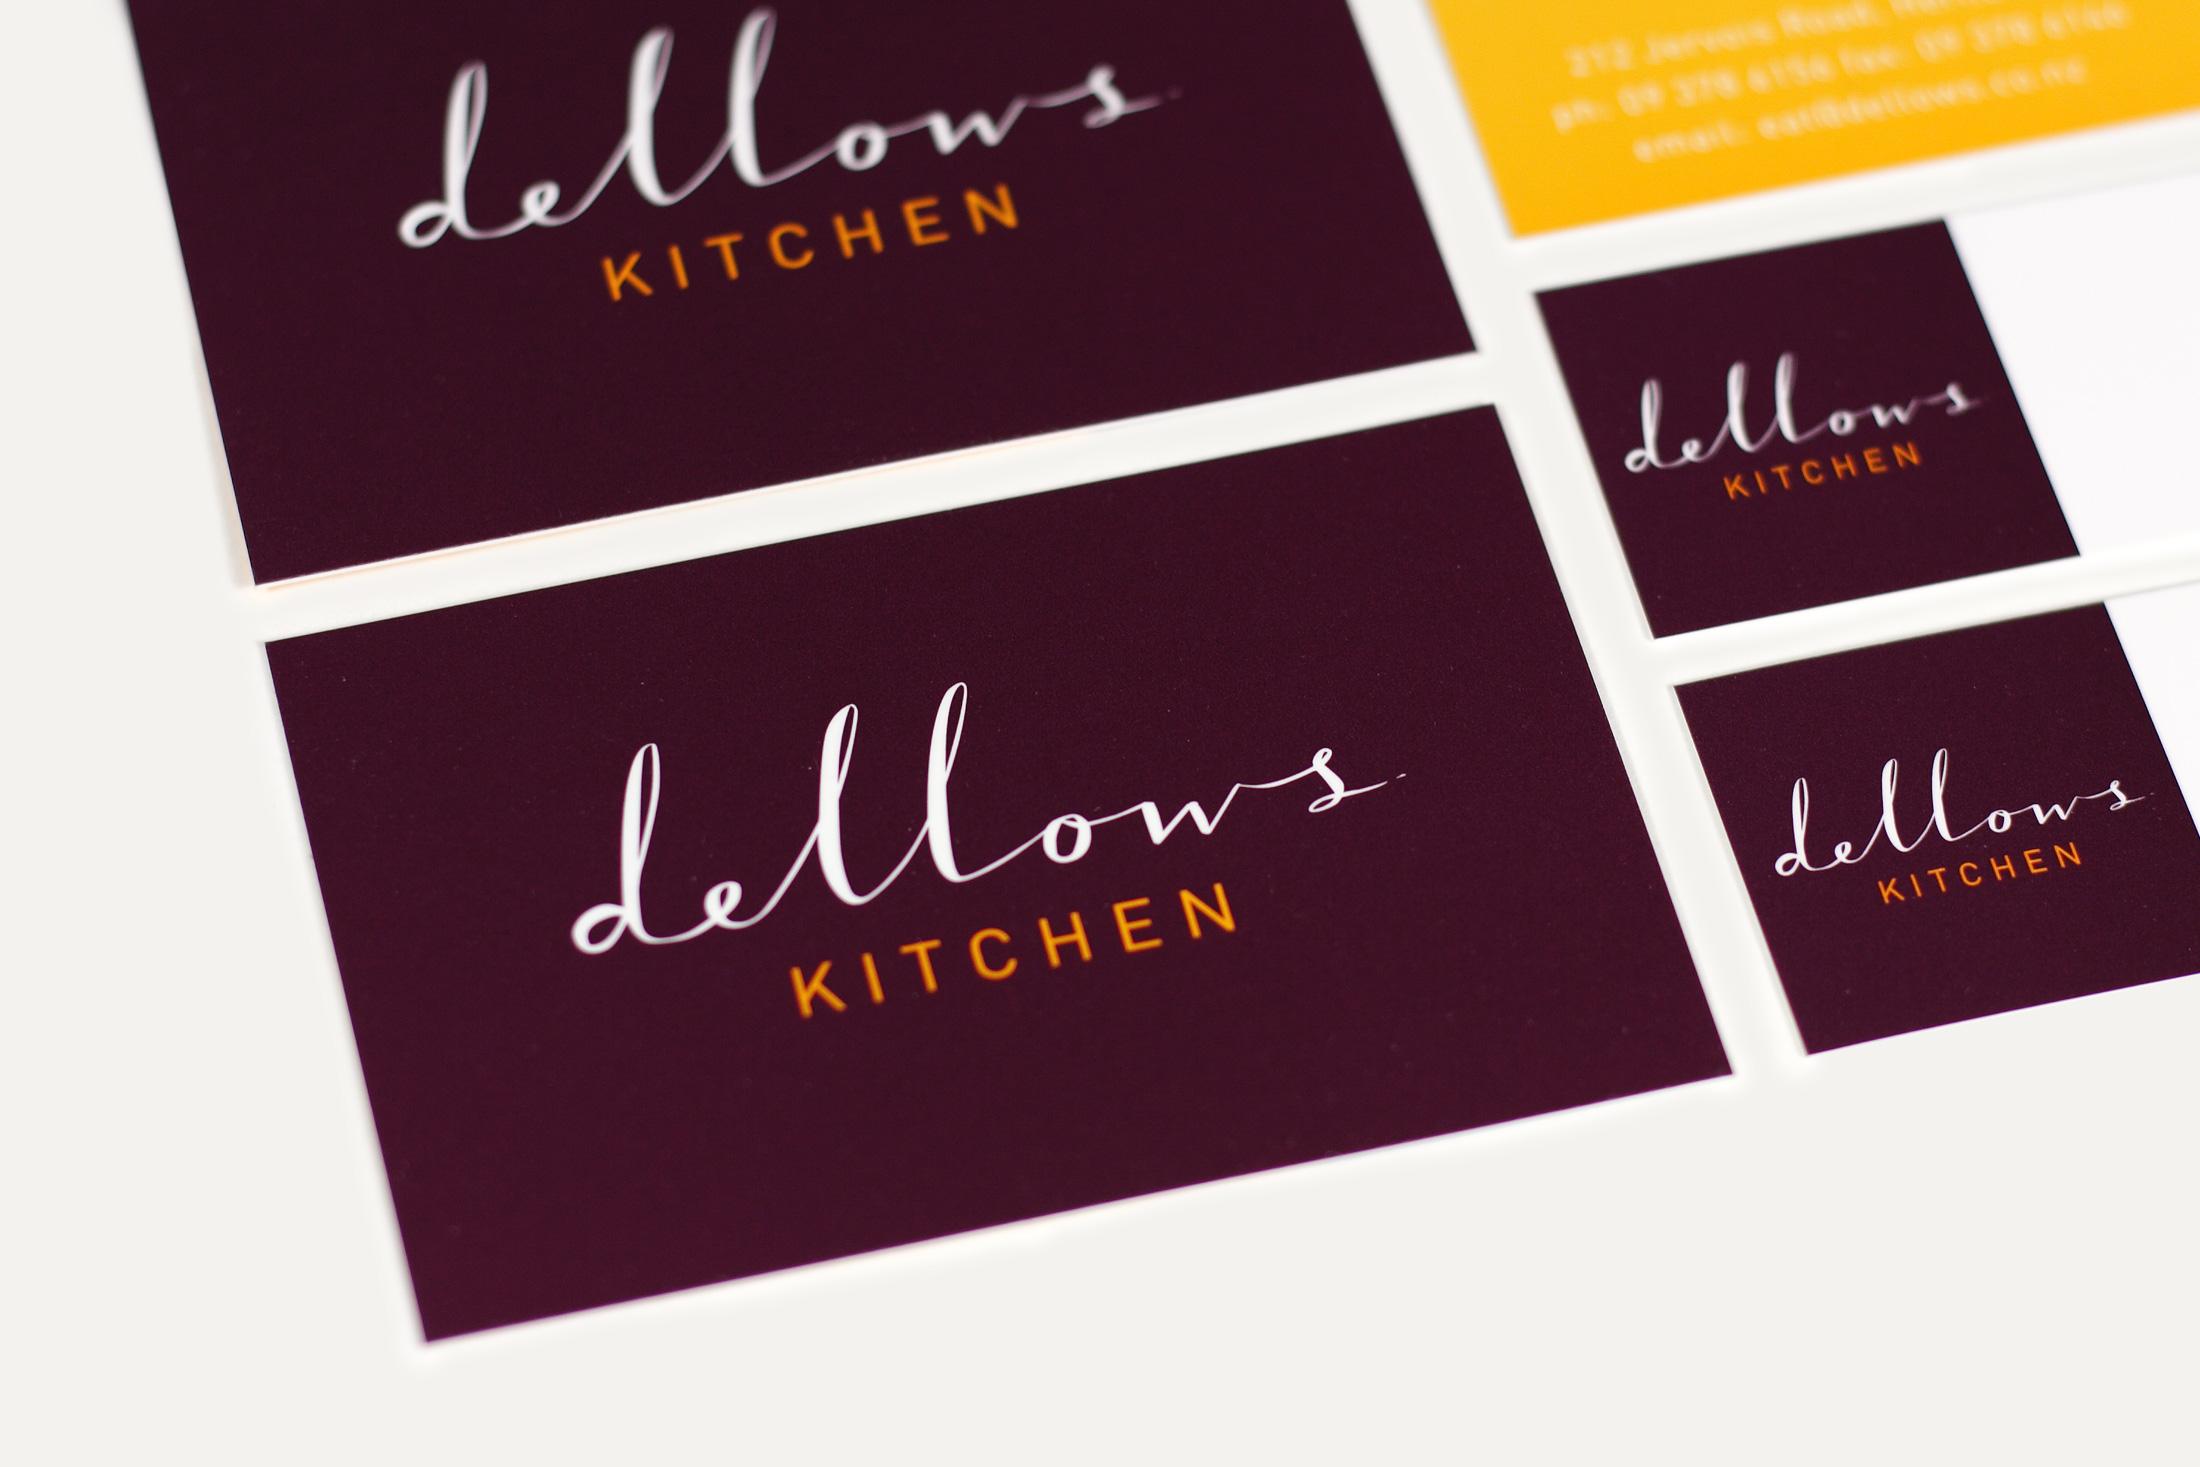 Dellows Kitchen